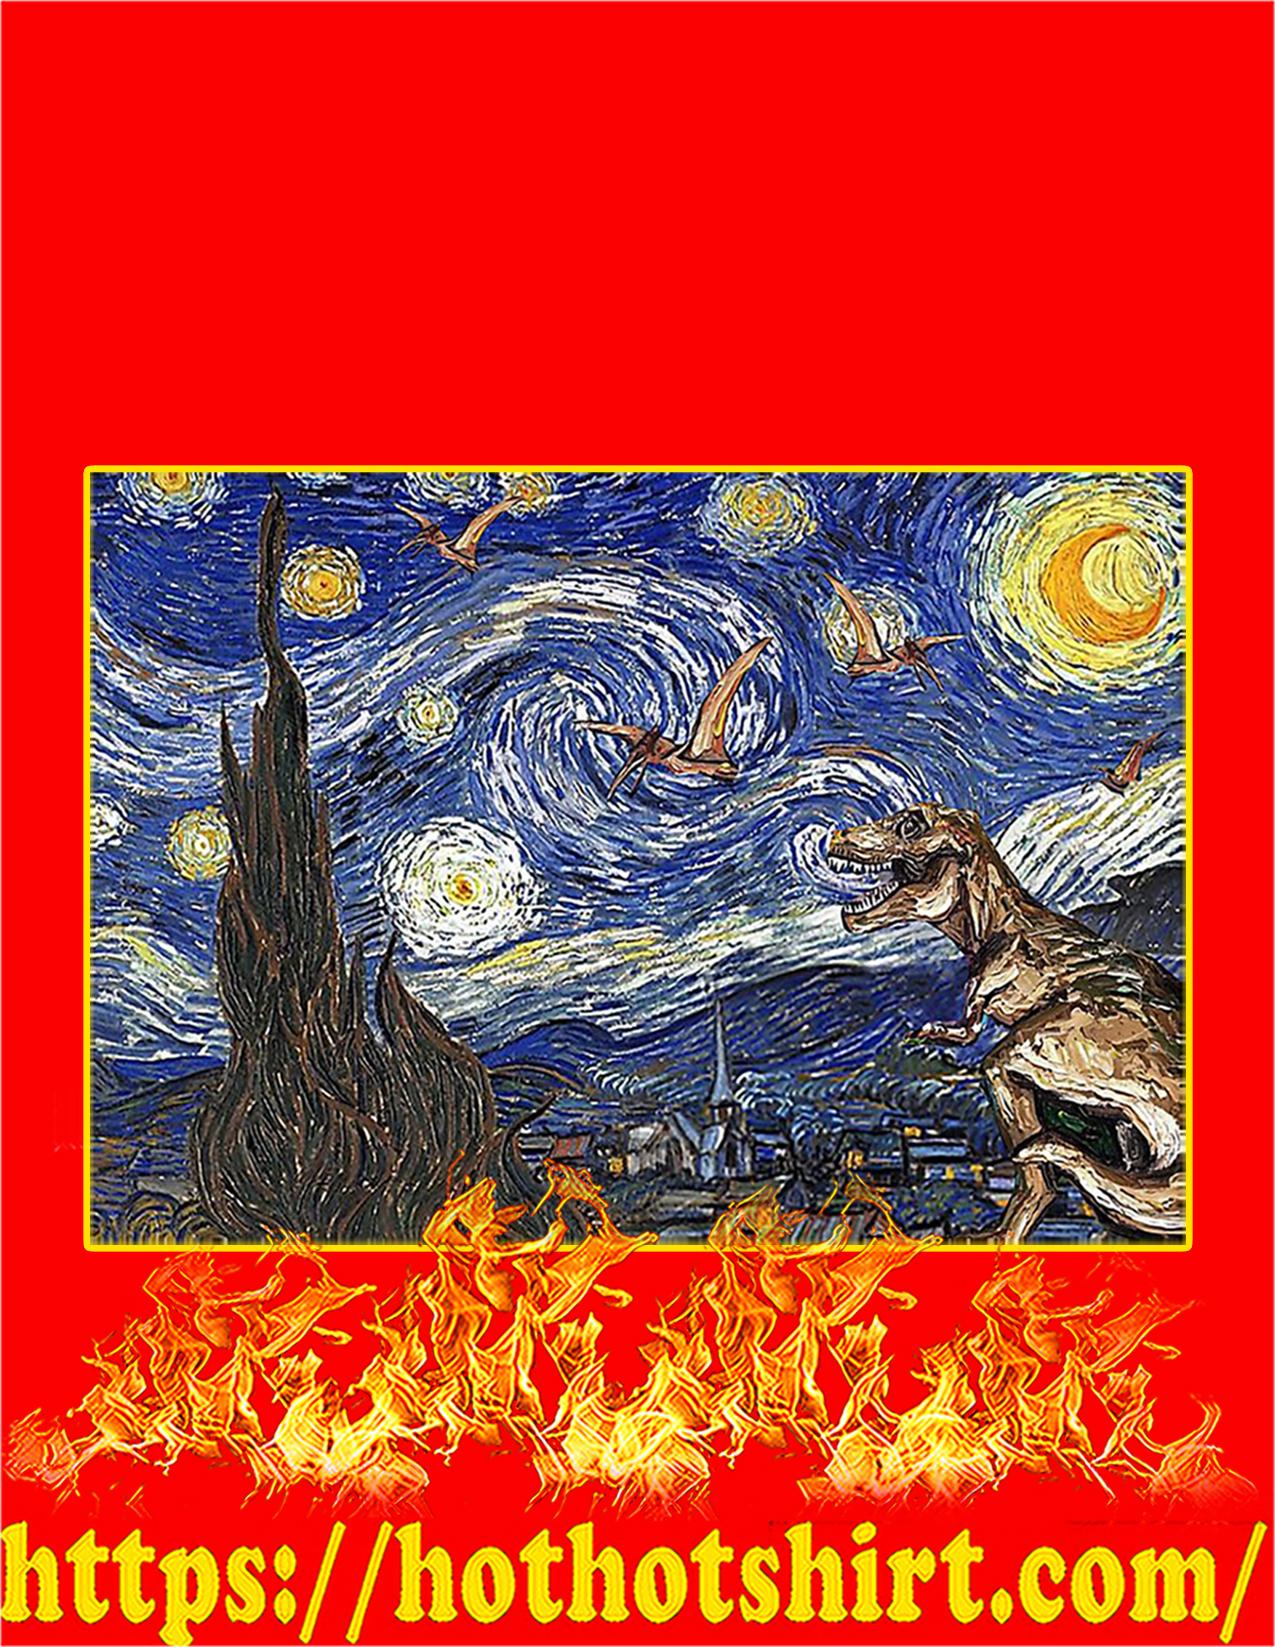 Starry night dinosaur poster - A2